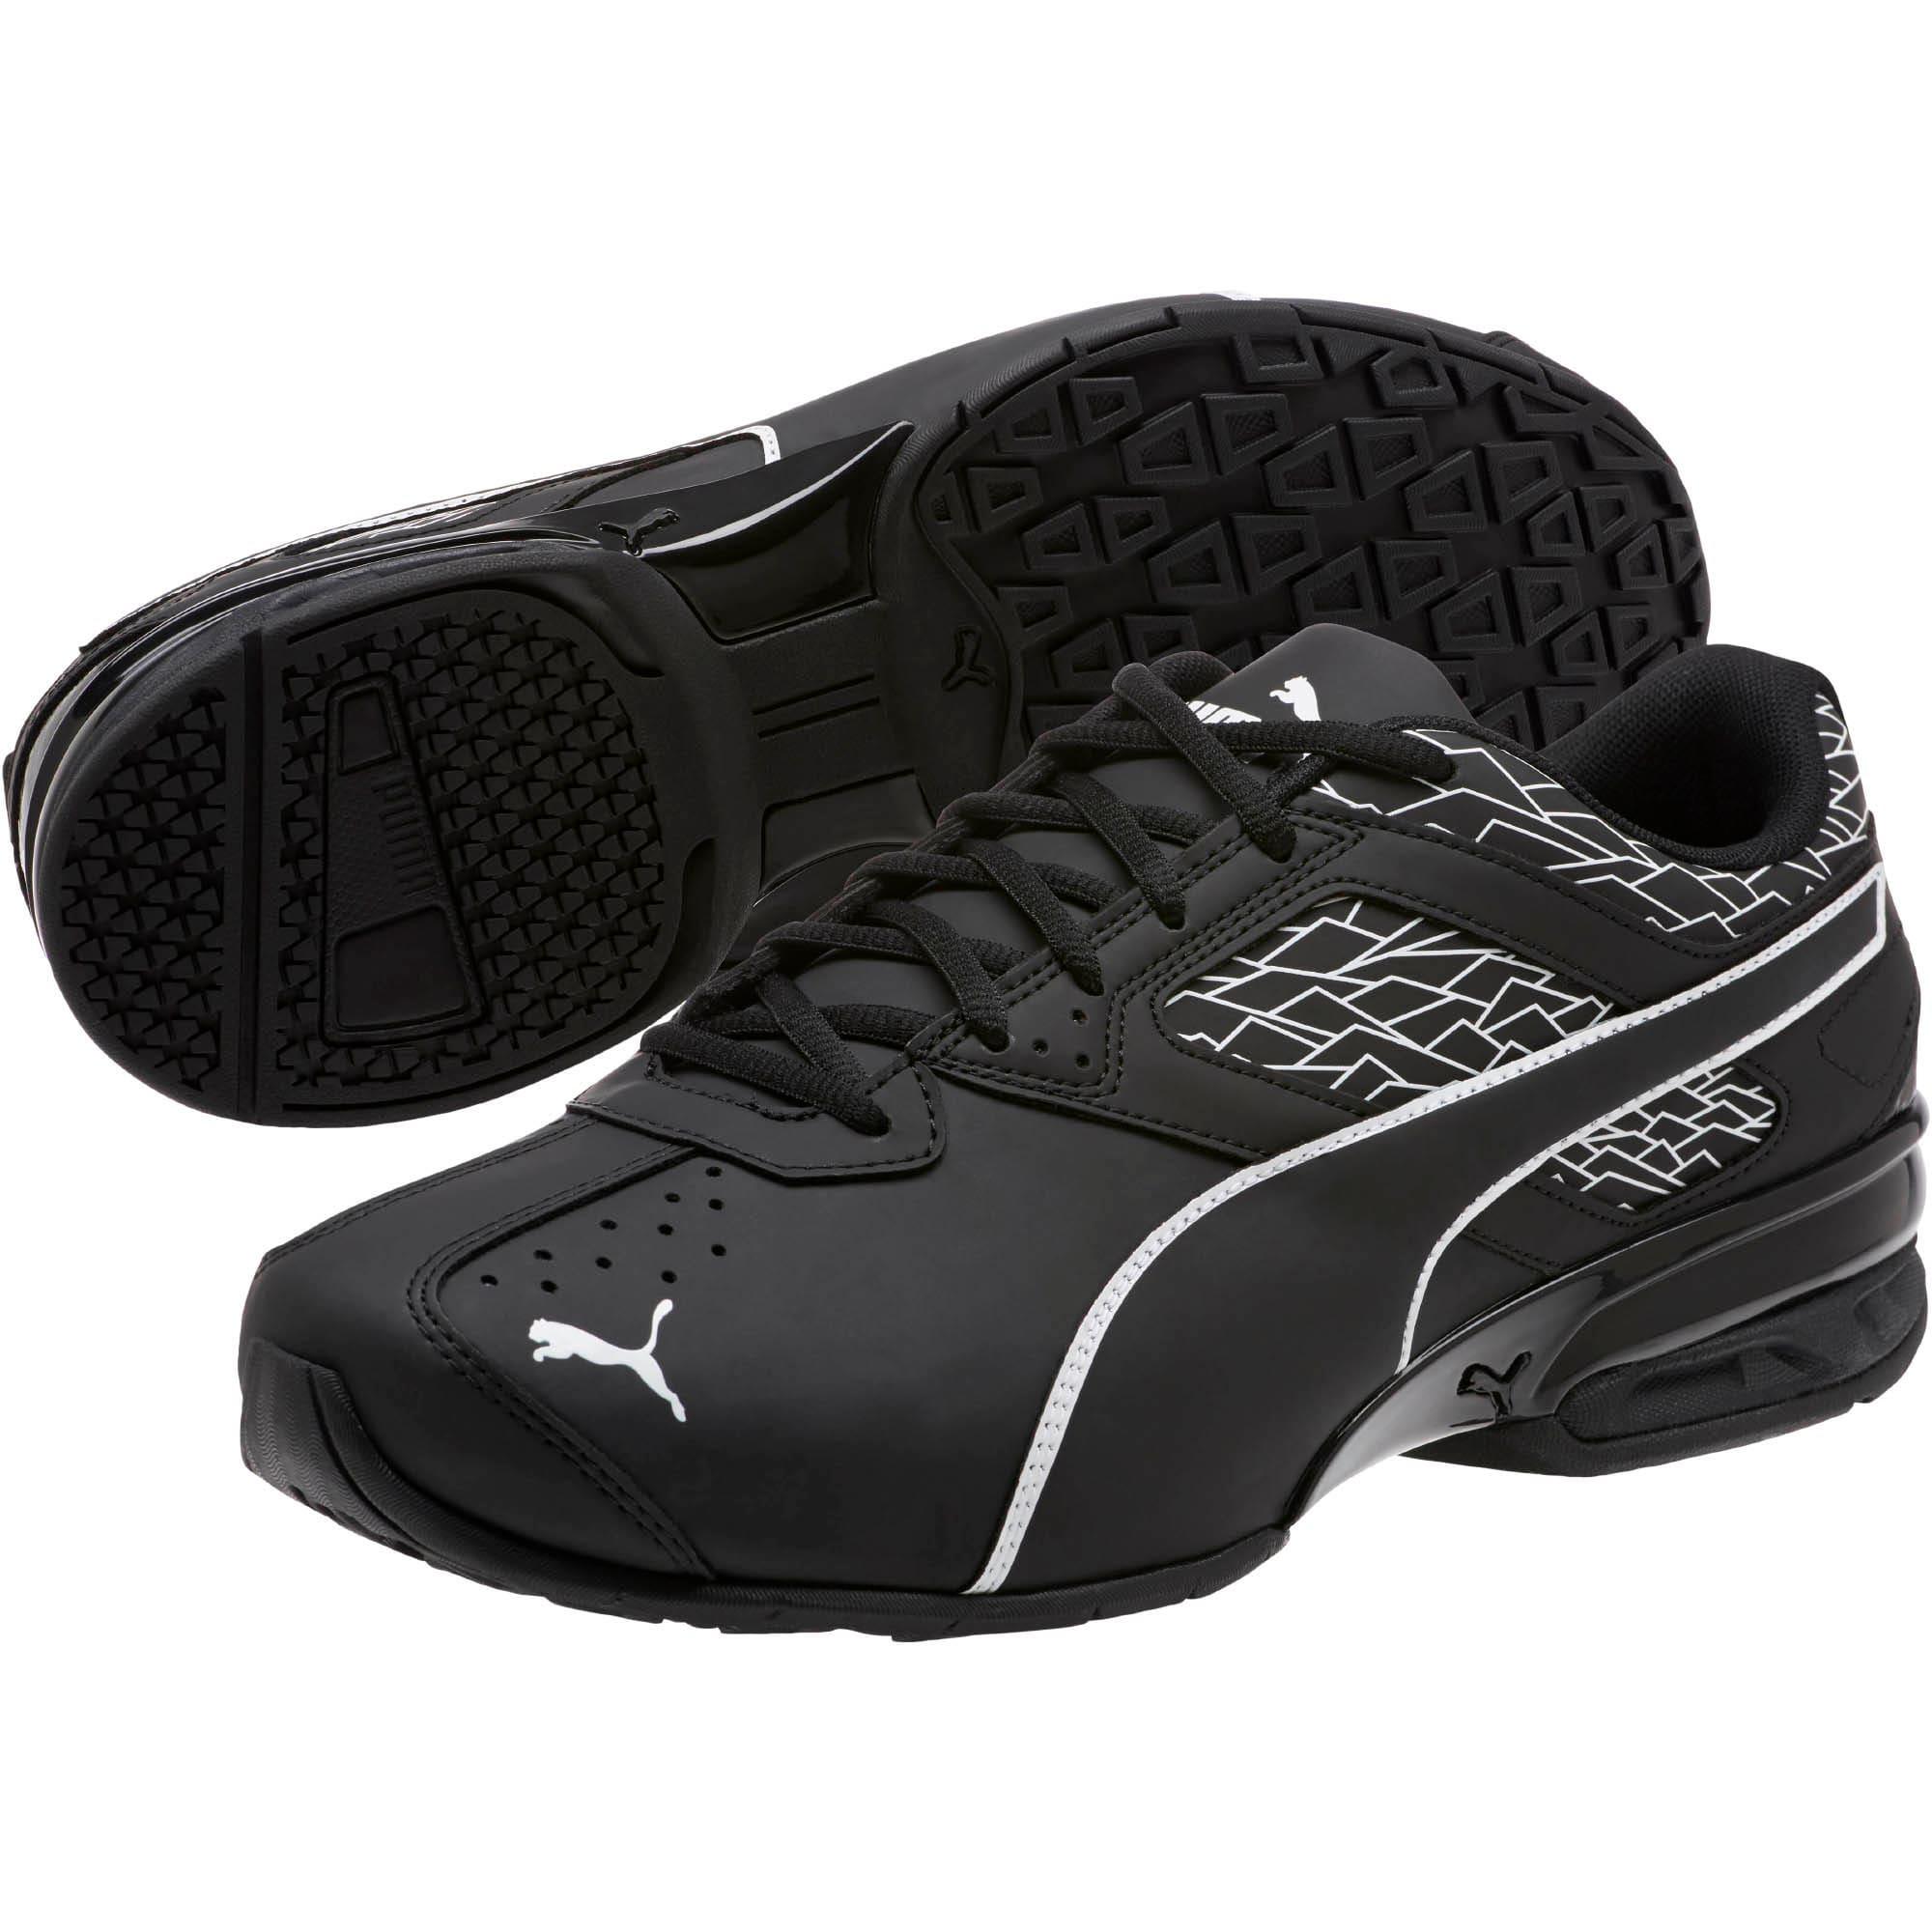 Thumbnail 2 of Tazon 6 Fracture FM Wide Men's Sneakers, Puma Black-Puma Black, medium